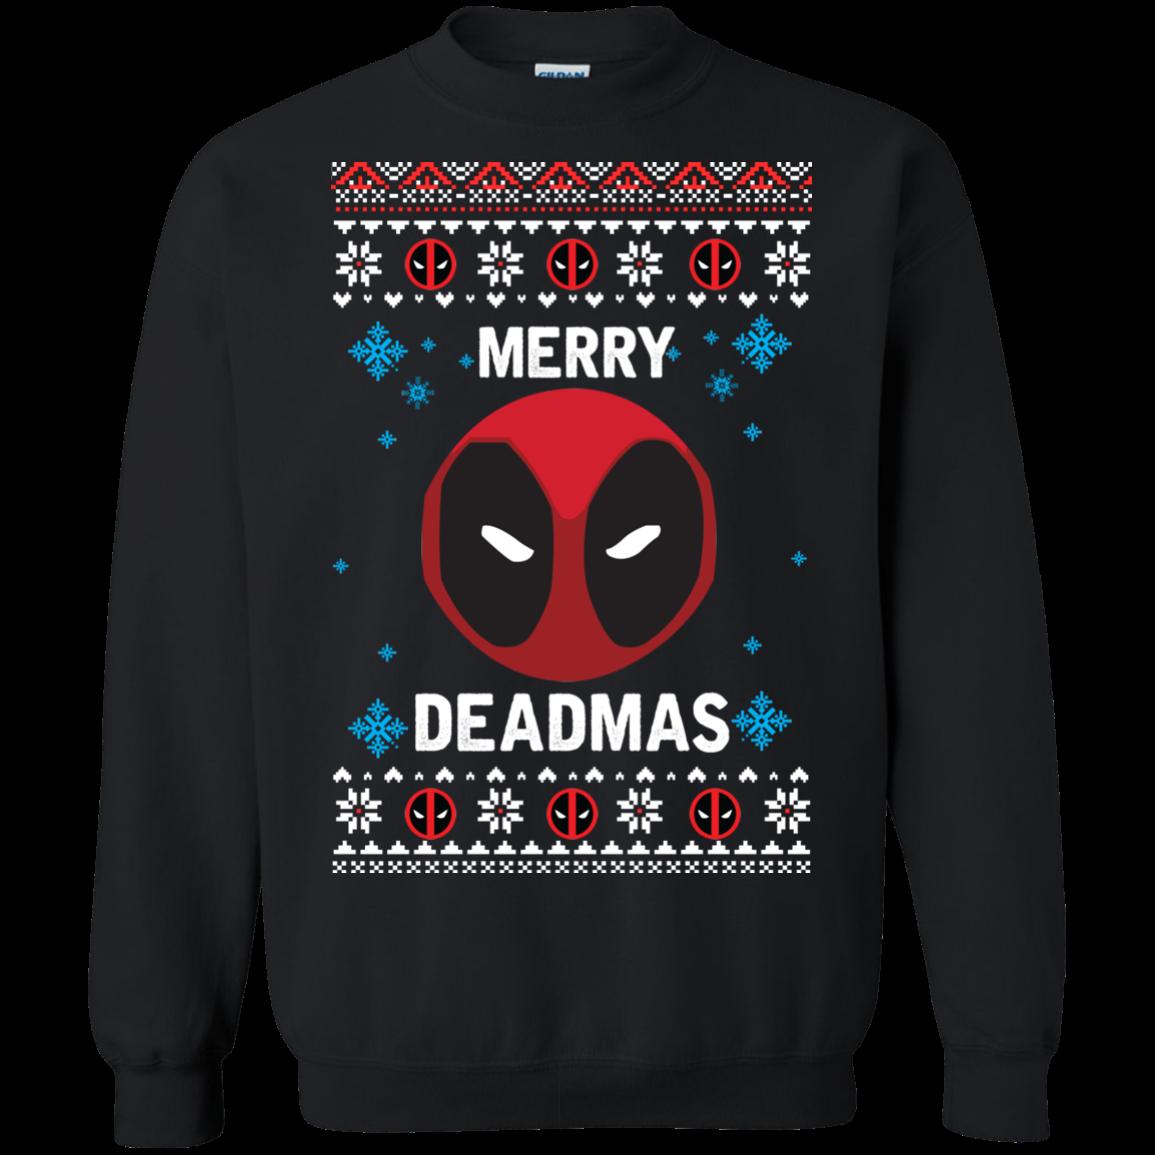 DeadPool Christmas Sweater, Tshirt, Long Sleeve ...  Deadpool Christmas Sweater